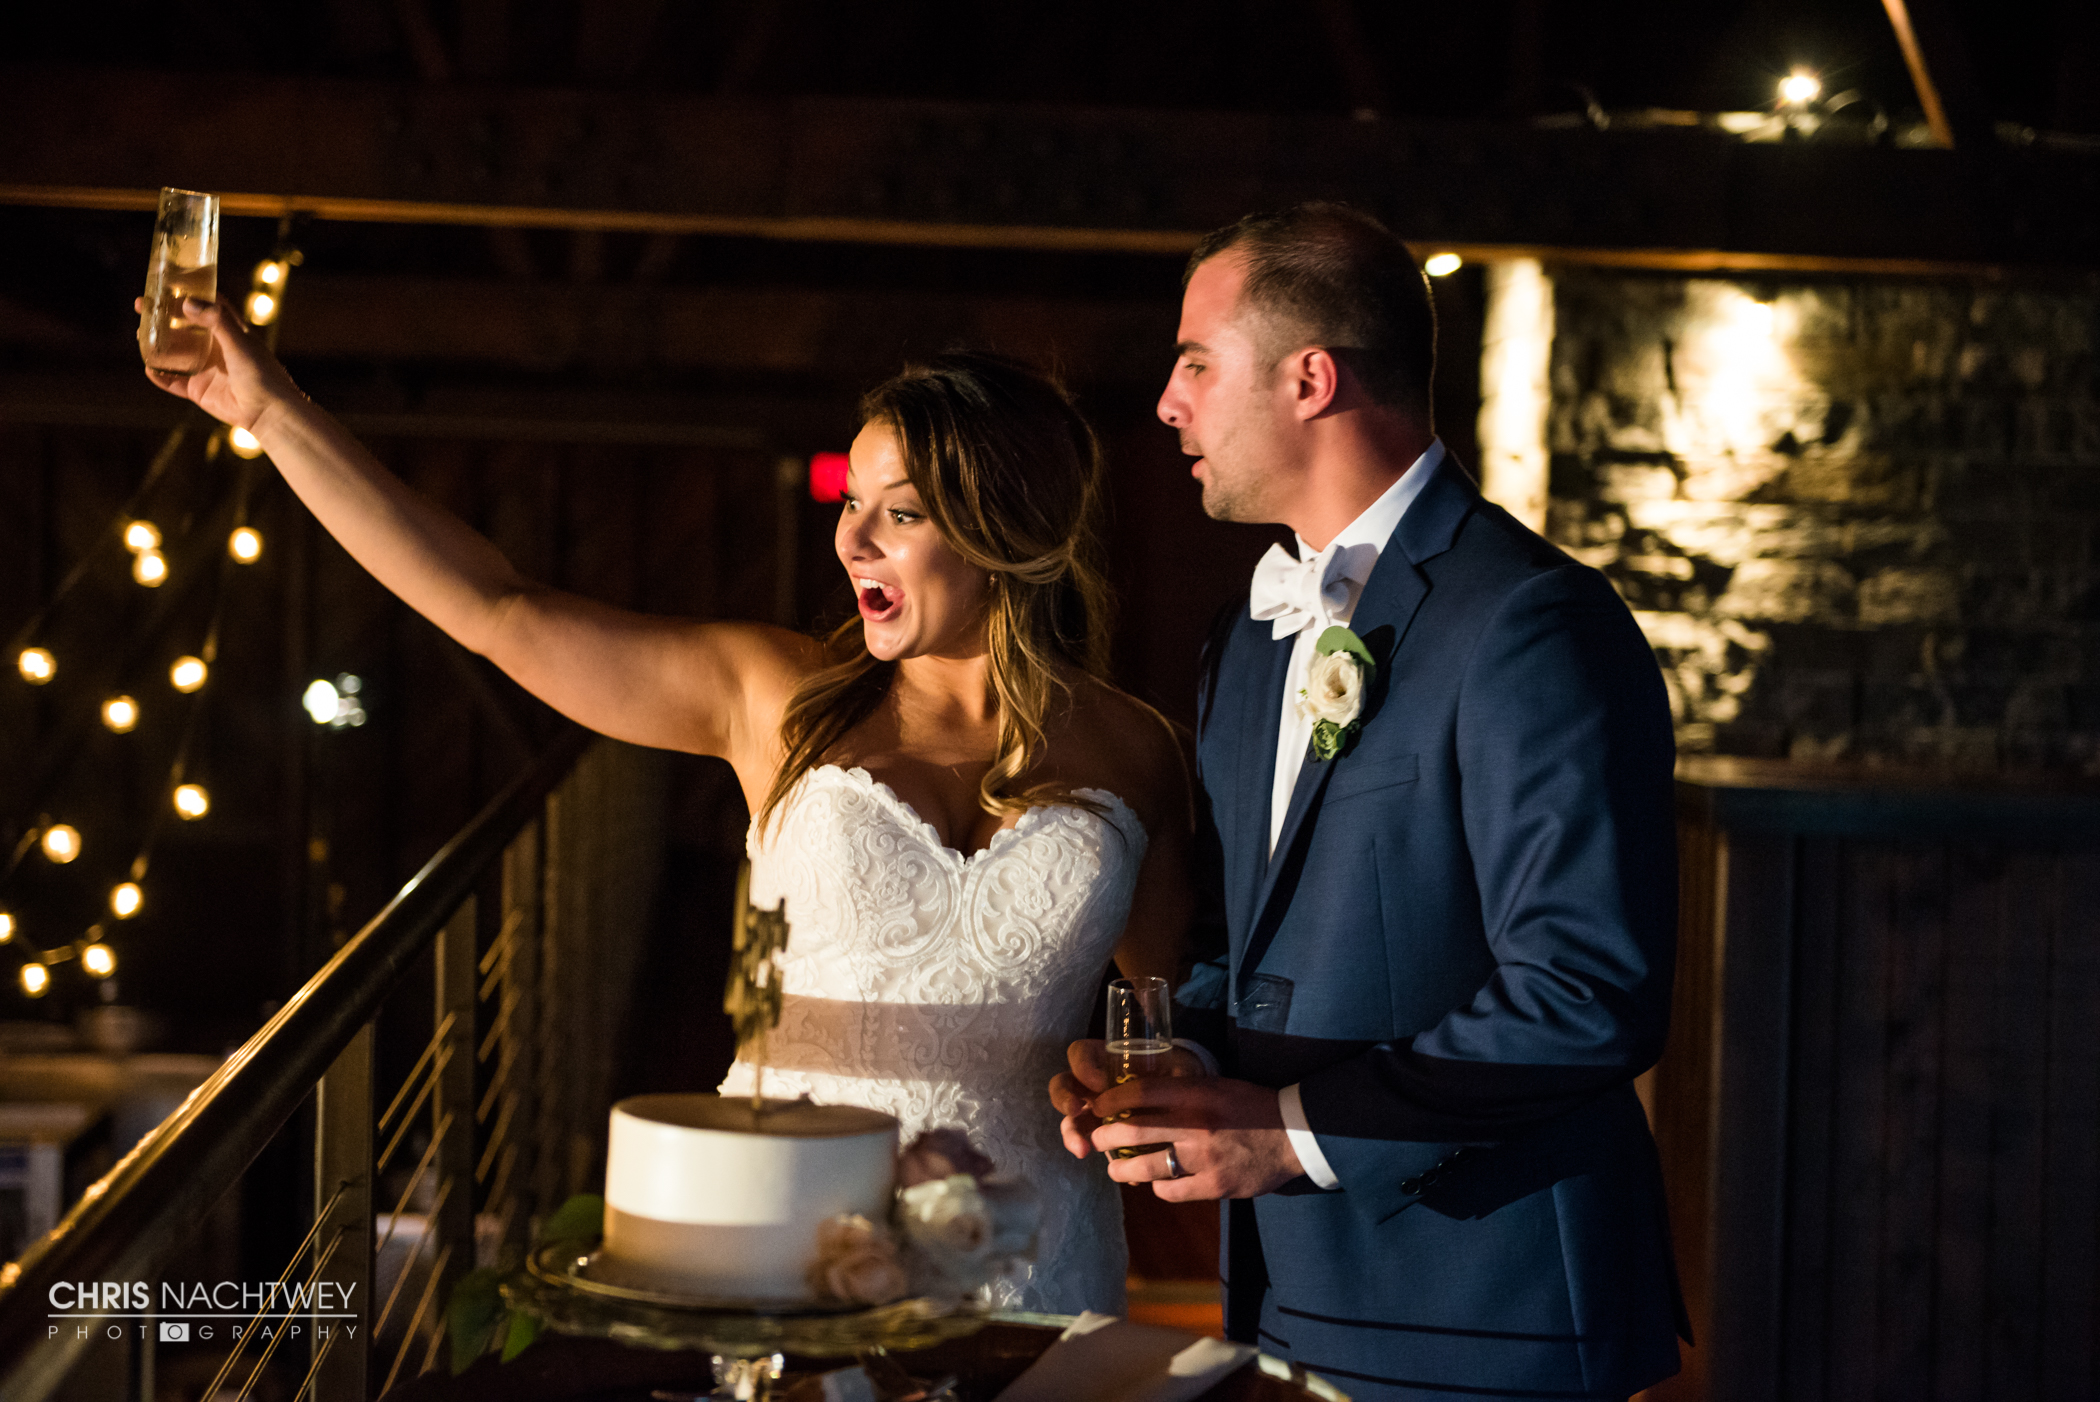 saltwater-farm-vineyard-wedding-photos-lindsay-gabe-chris-nachtwey-photography-2017-53.jpg